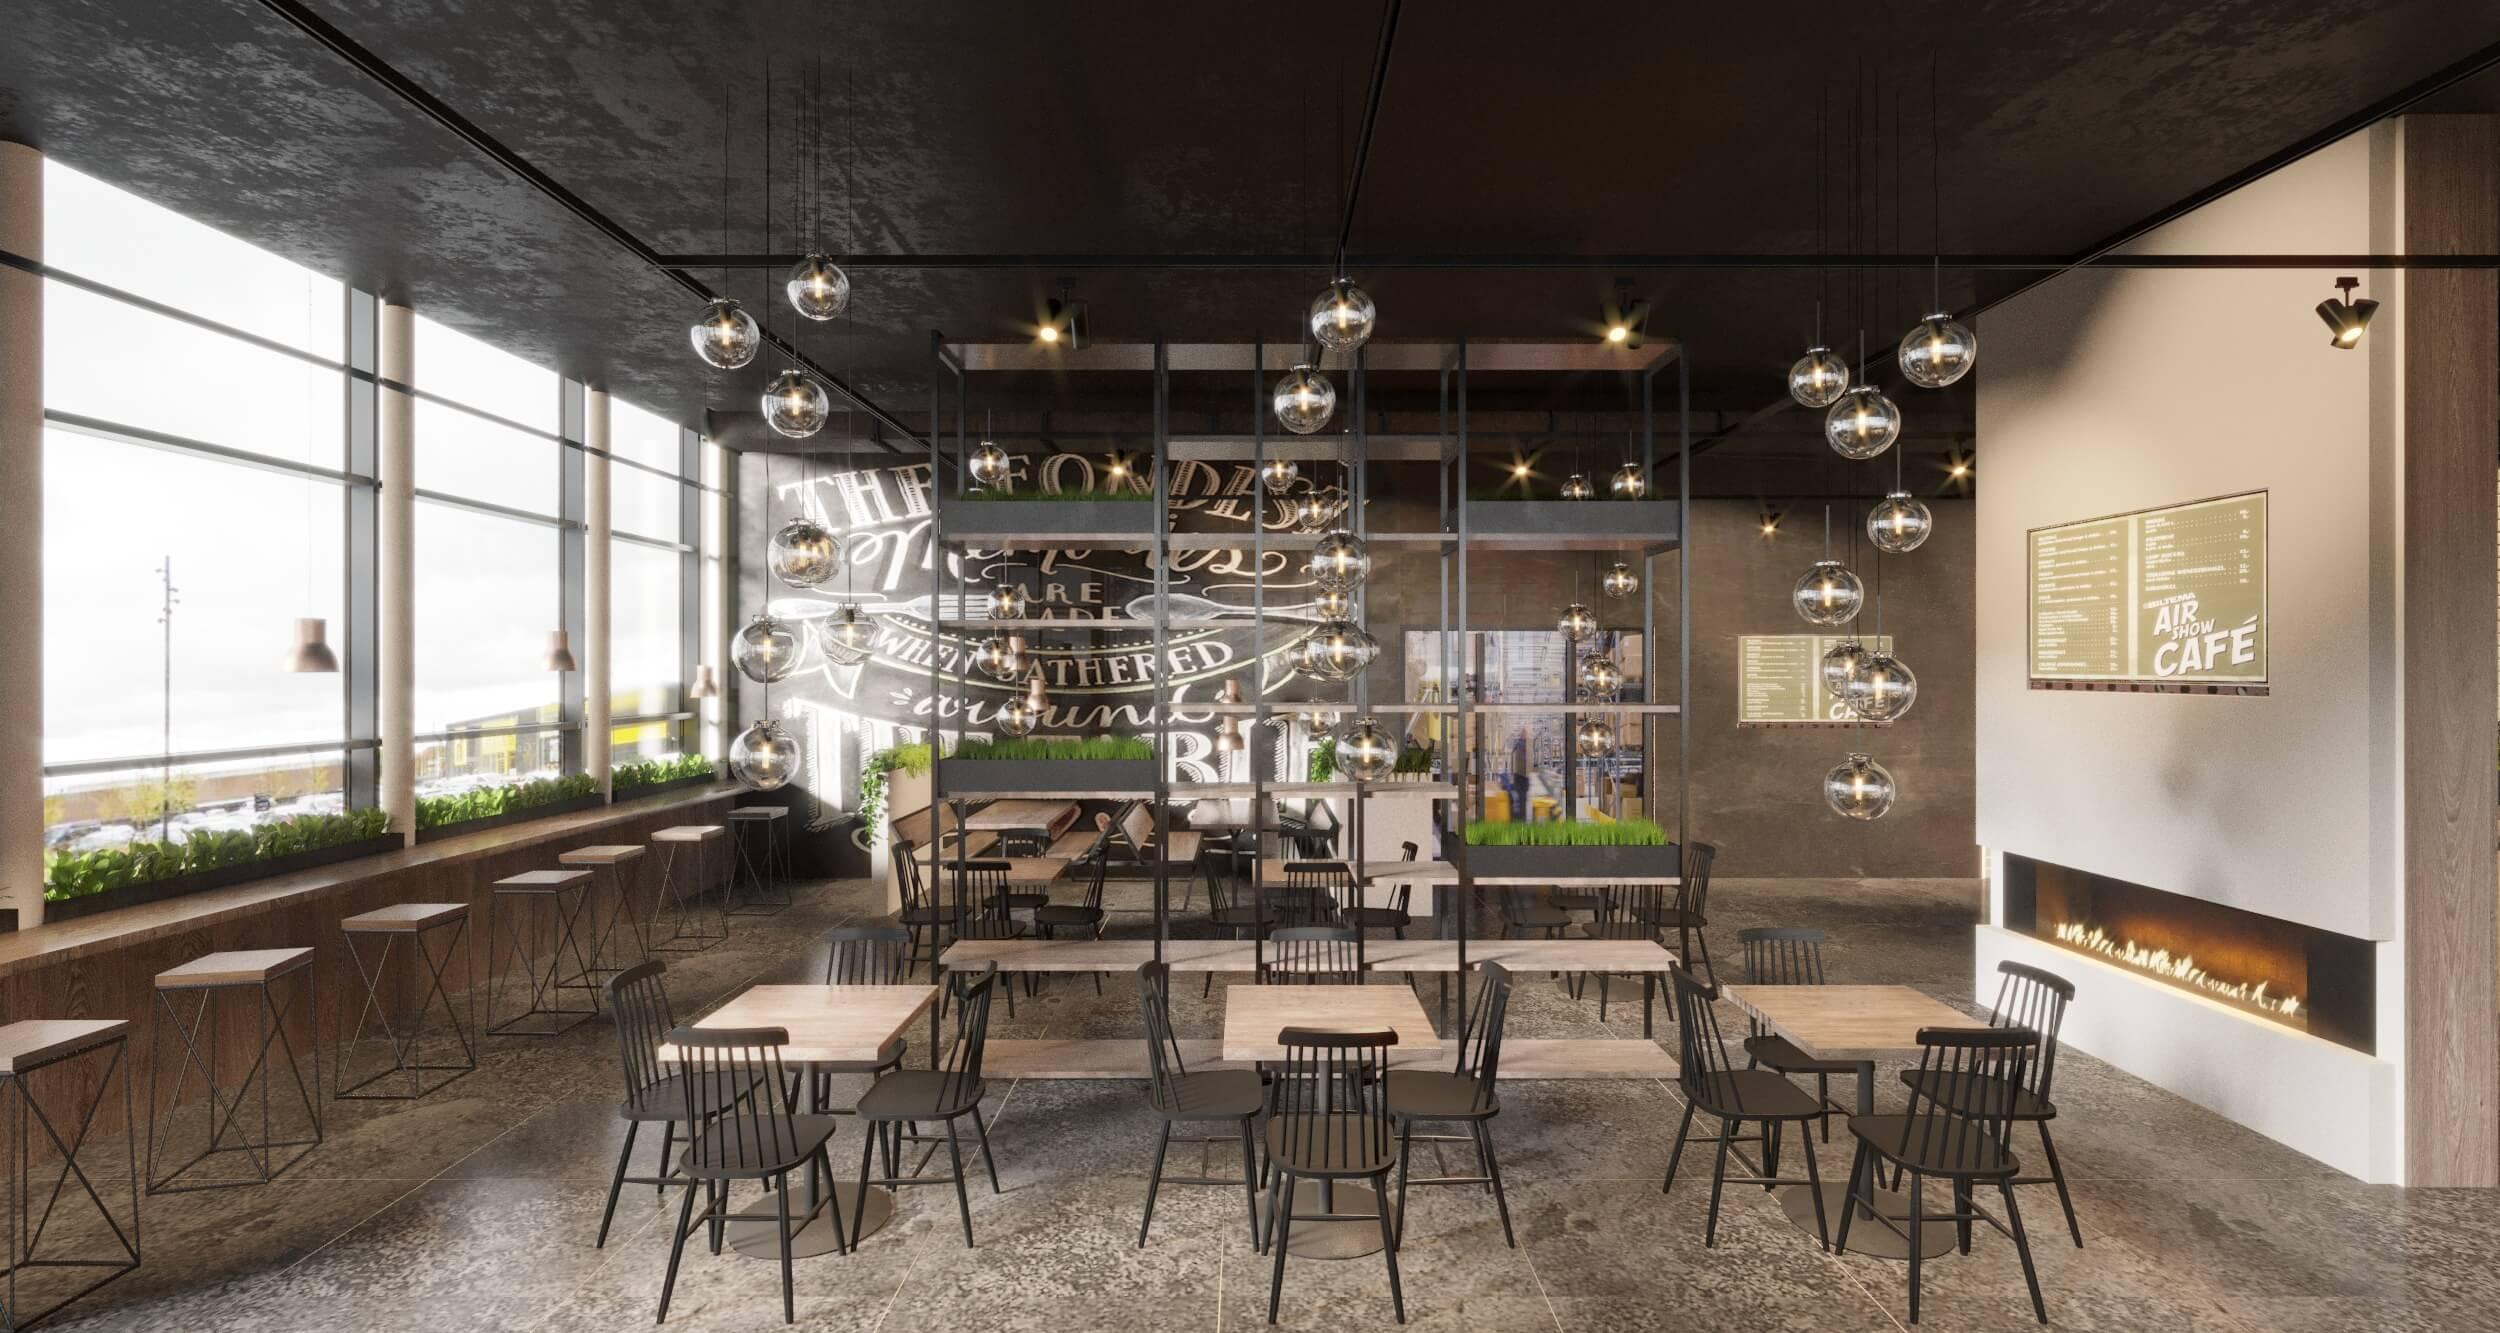 3D-Vizual   3D Visualisering   Cafe indretning   Hotel & Restaurant 3 – Cafe/Restaurant Company